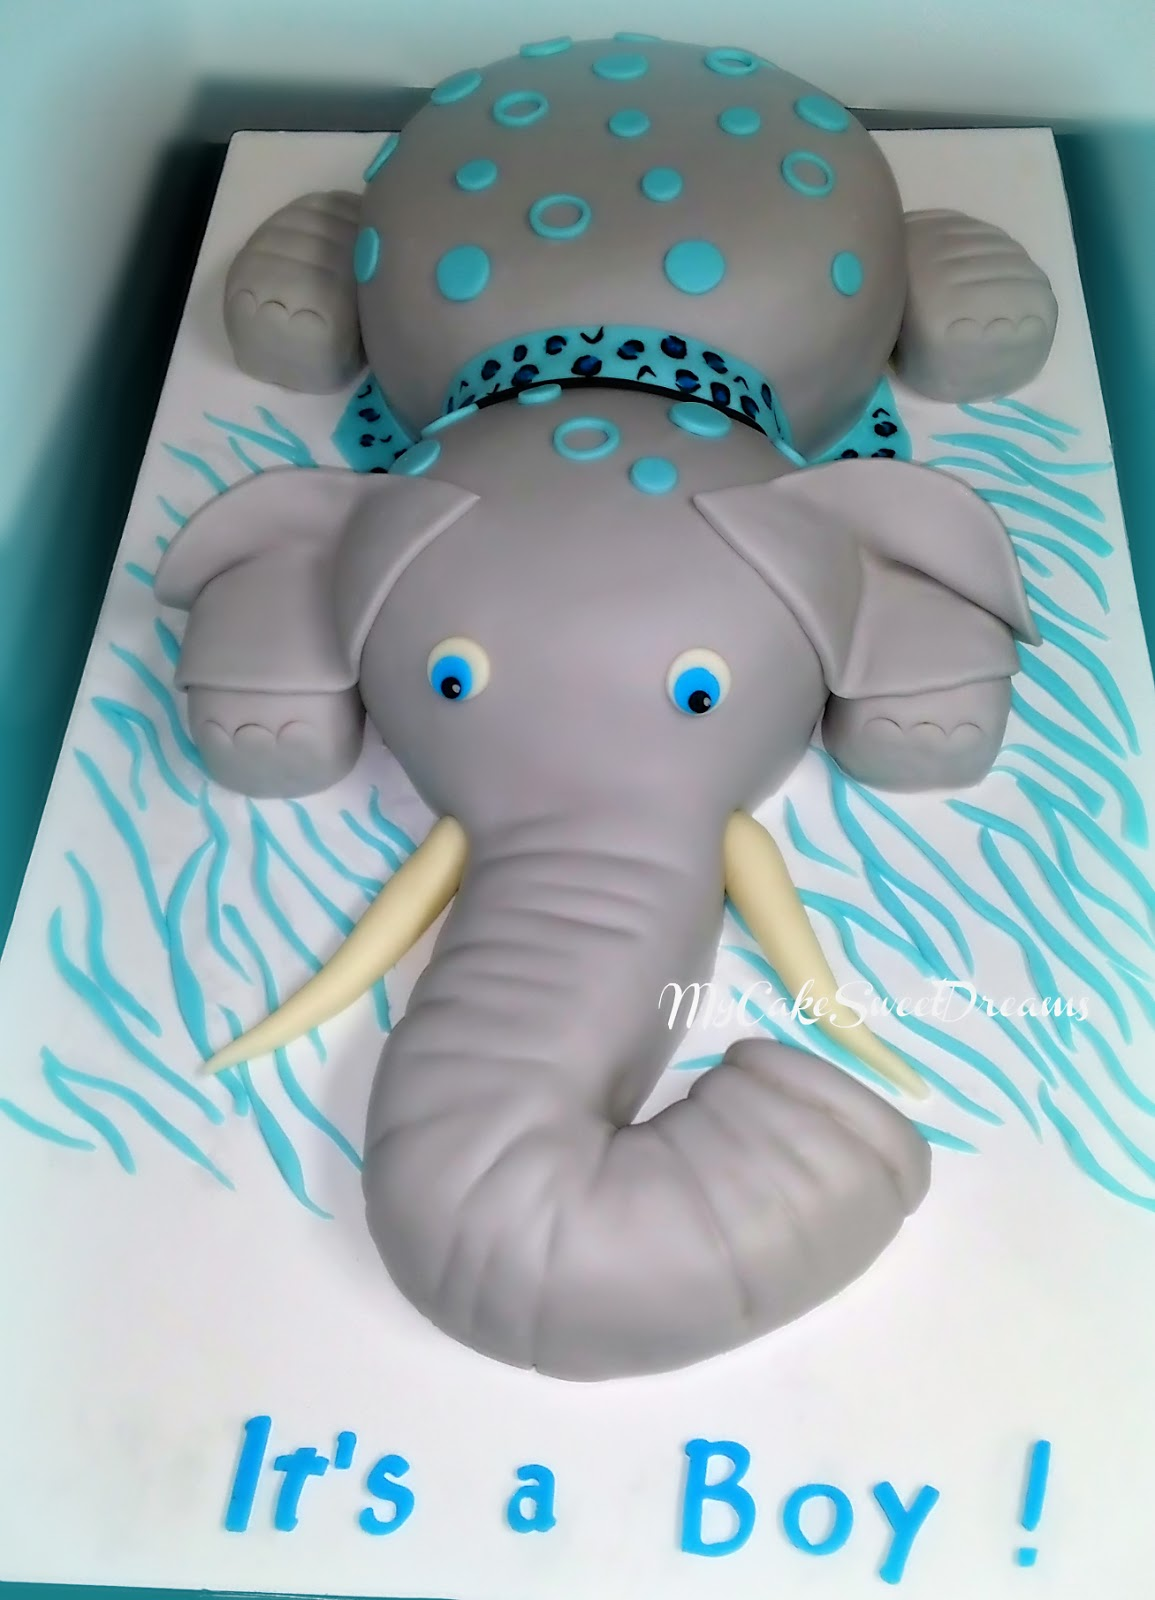 Baby Shower Cake Ideas With Elephants